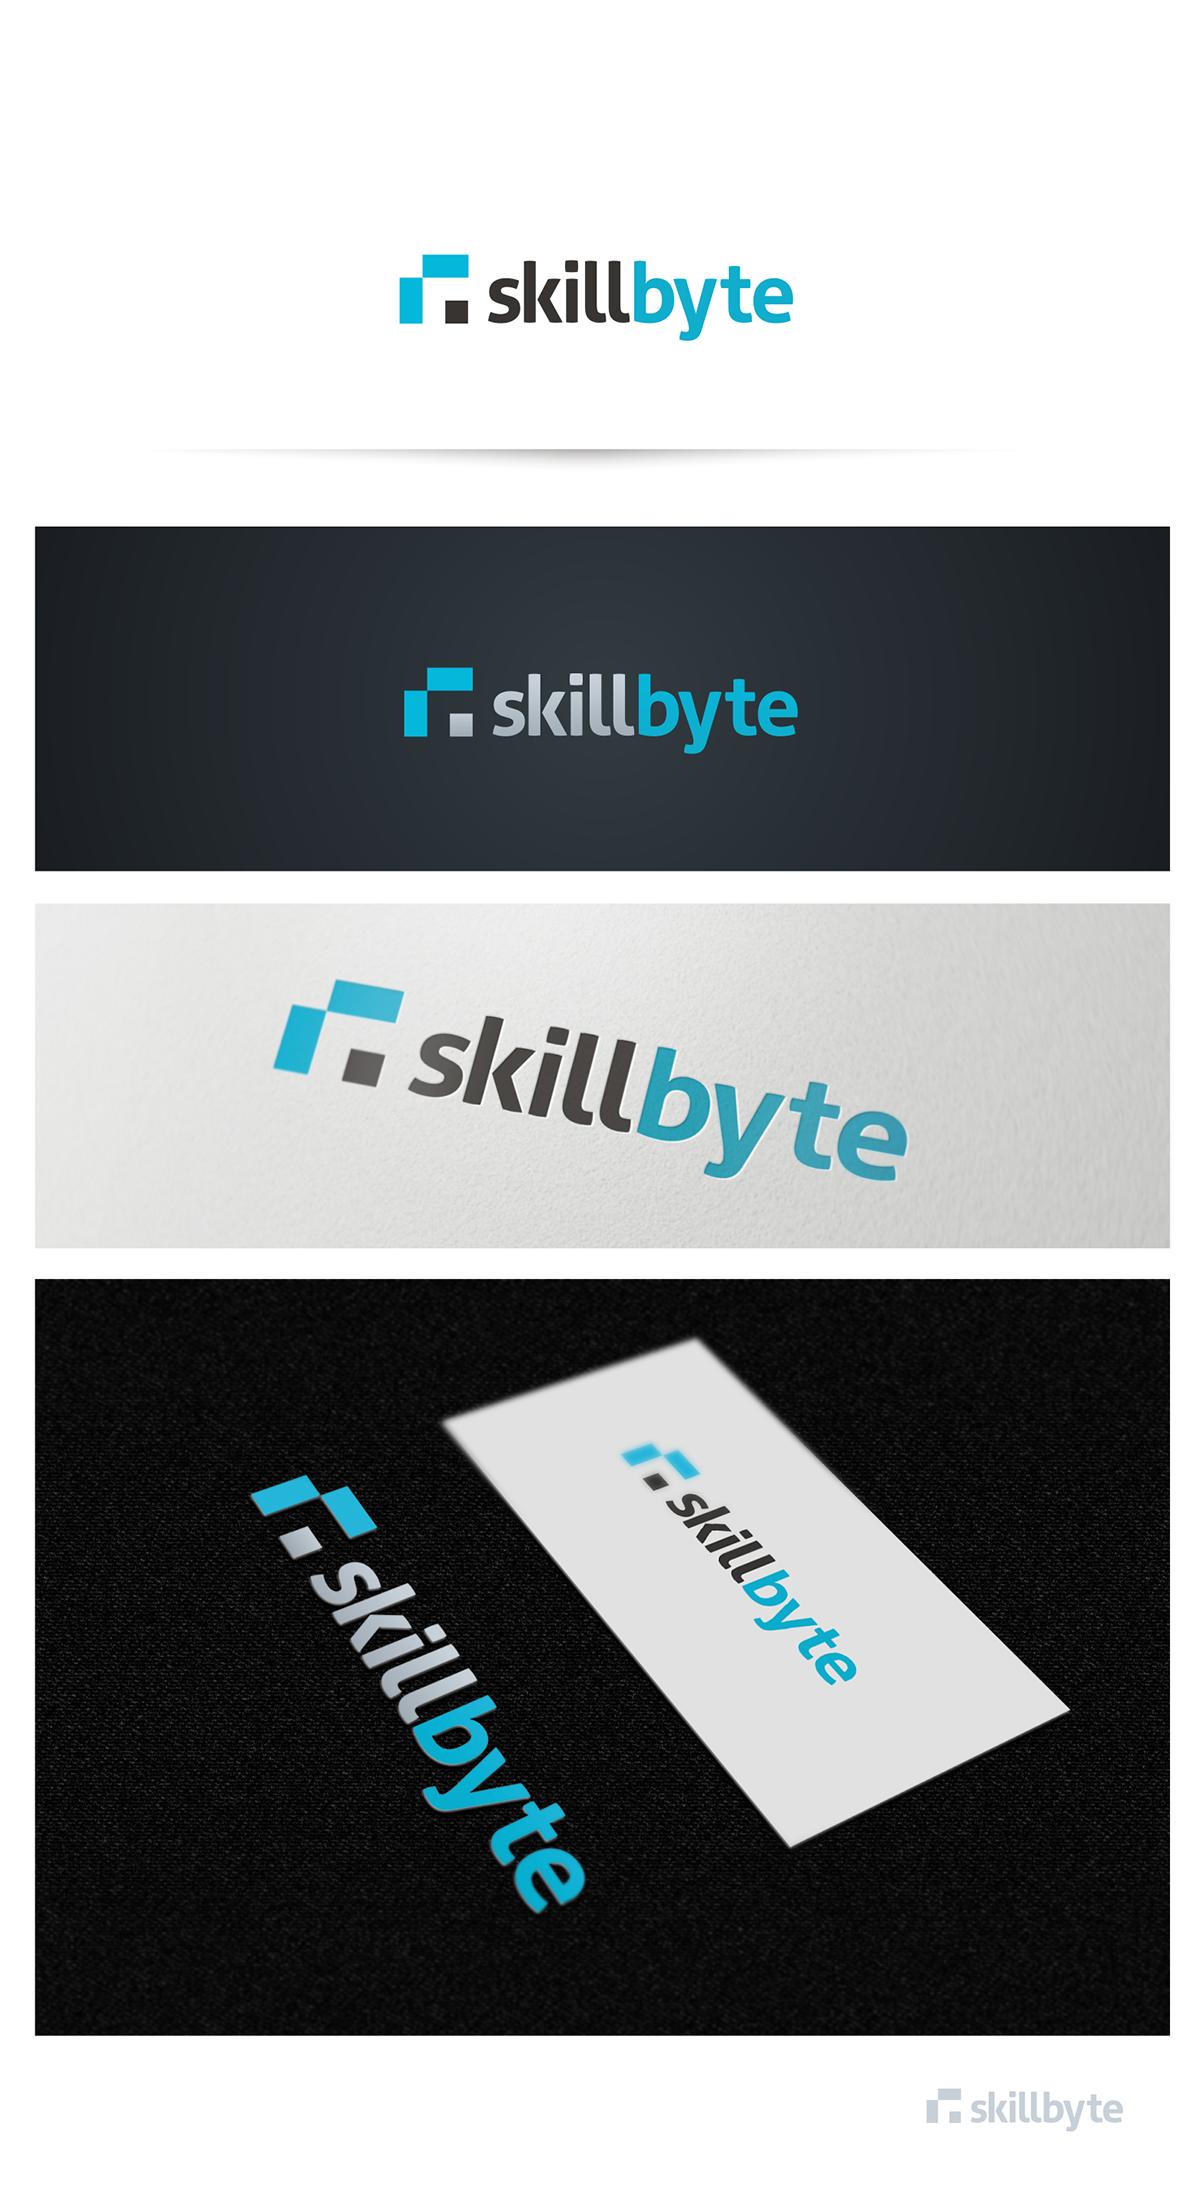 Create the next logo for SkillByte